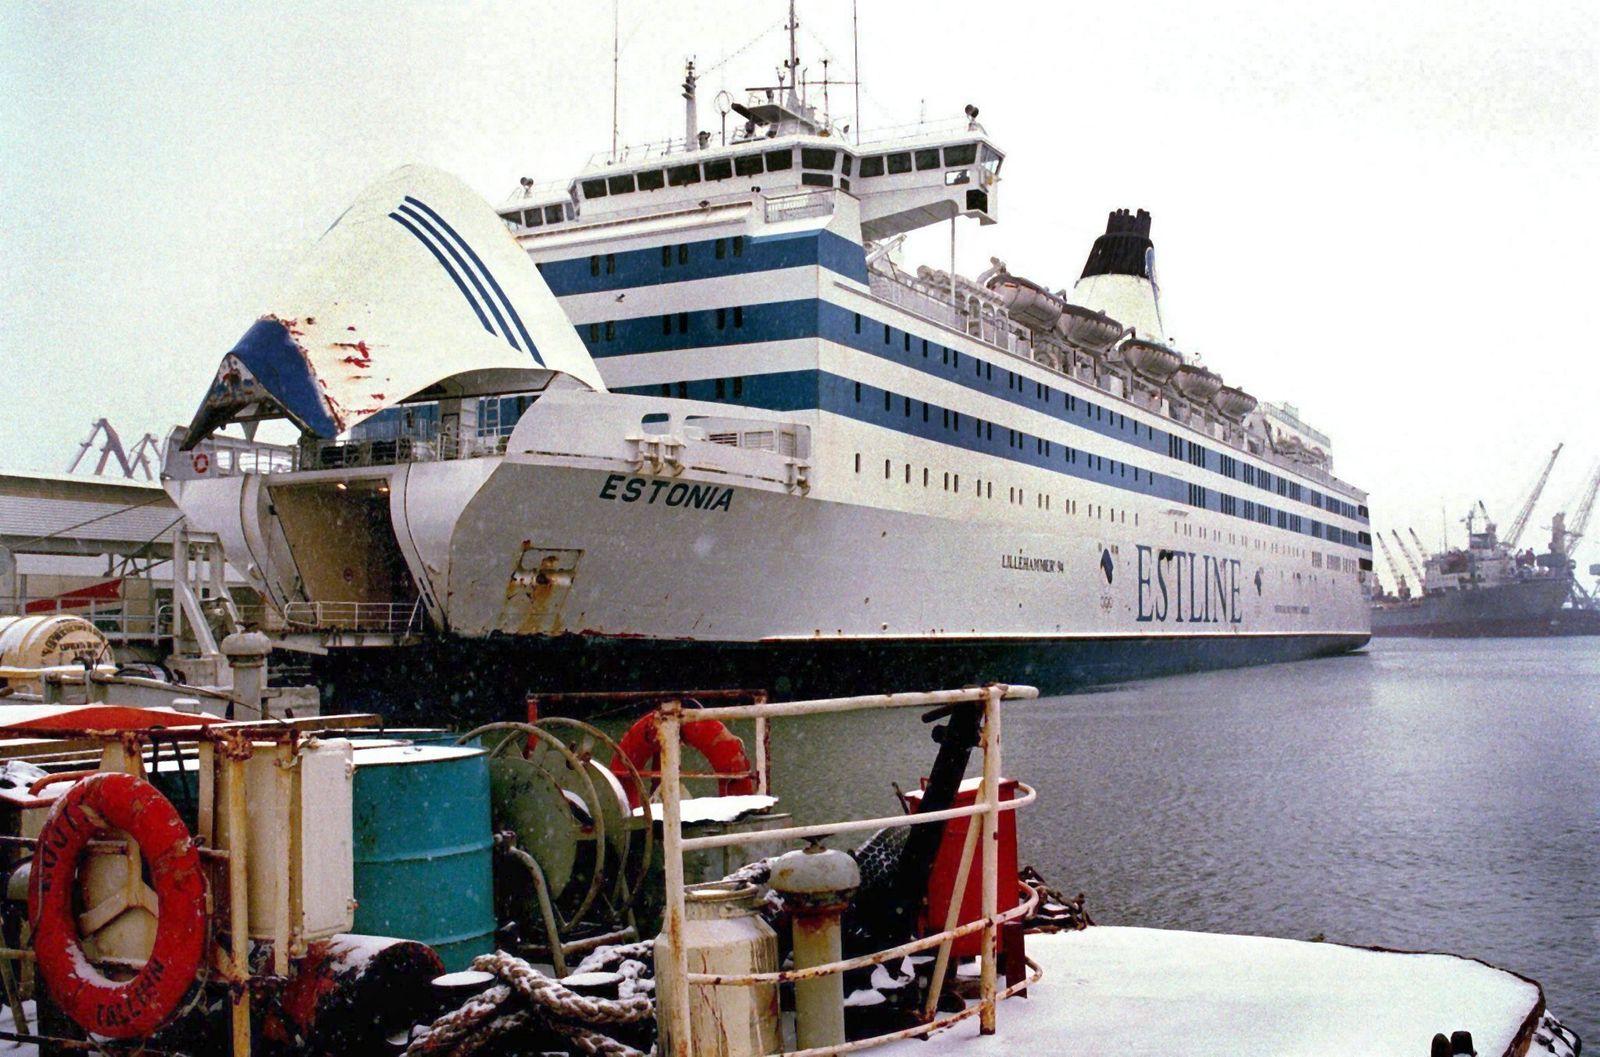 «Estonia»-Untergang: Neue Untersuchung angeordnet